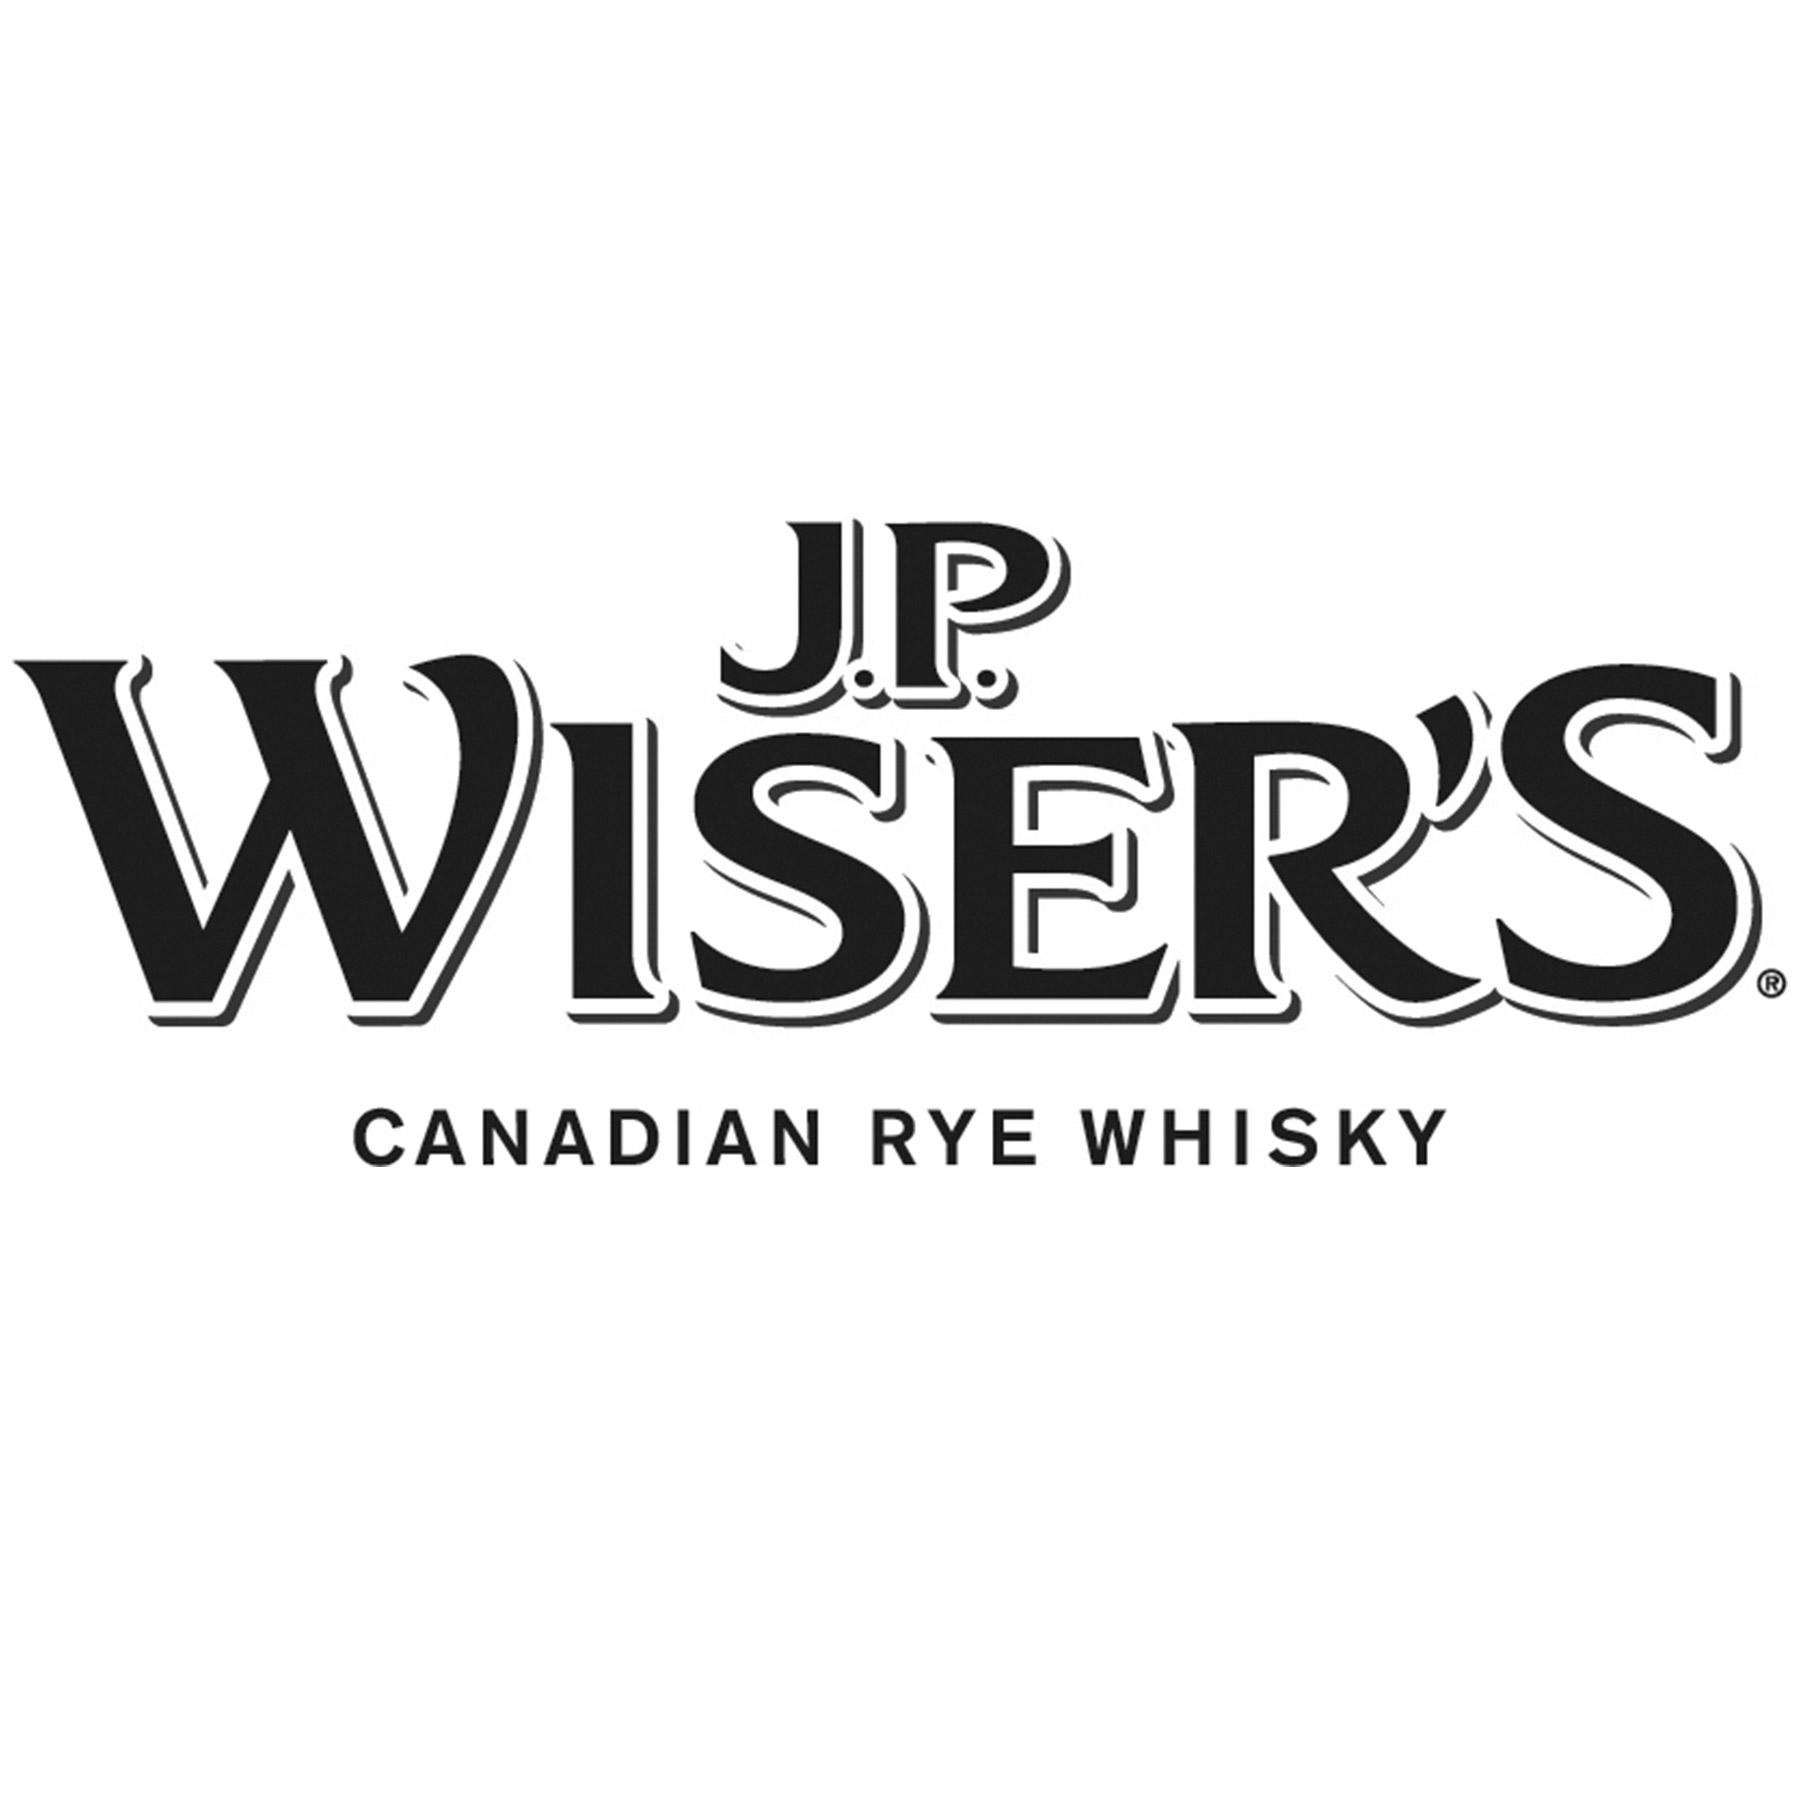 JP-Wisers-new19-B&W.jpg